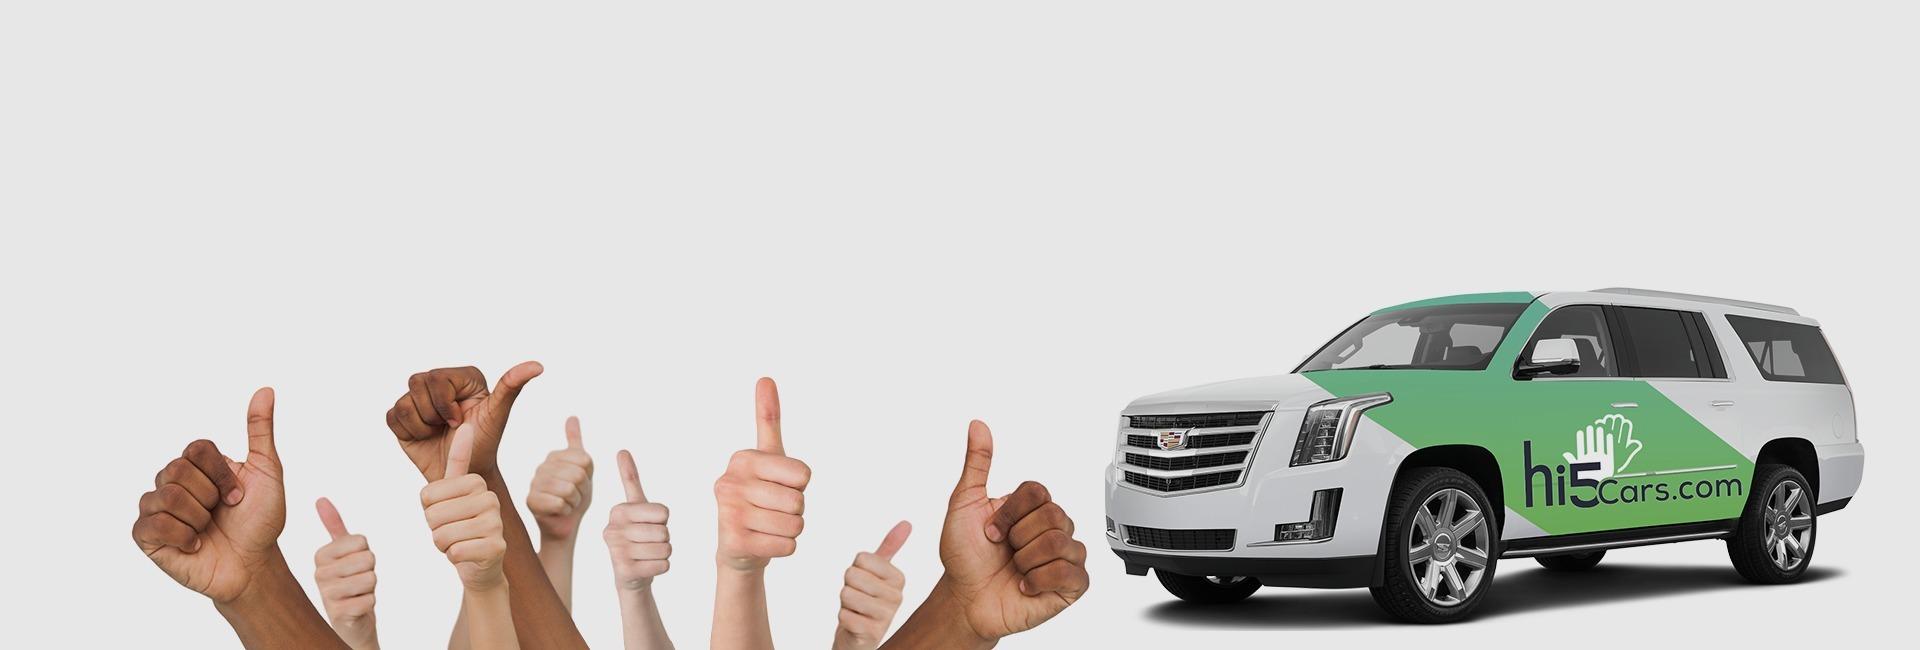 Bad Credit Auto Loan & Car Financing (@barediutoanmany44) Cover Image